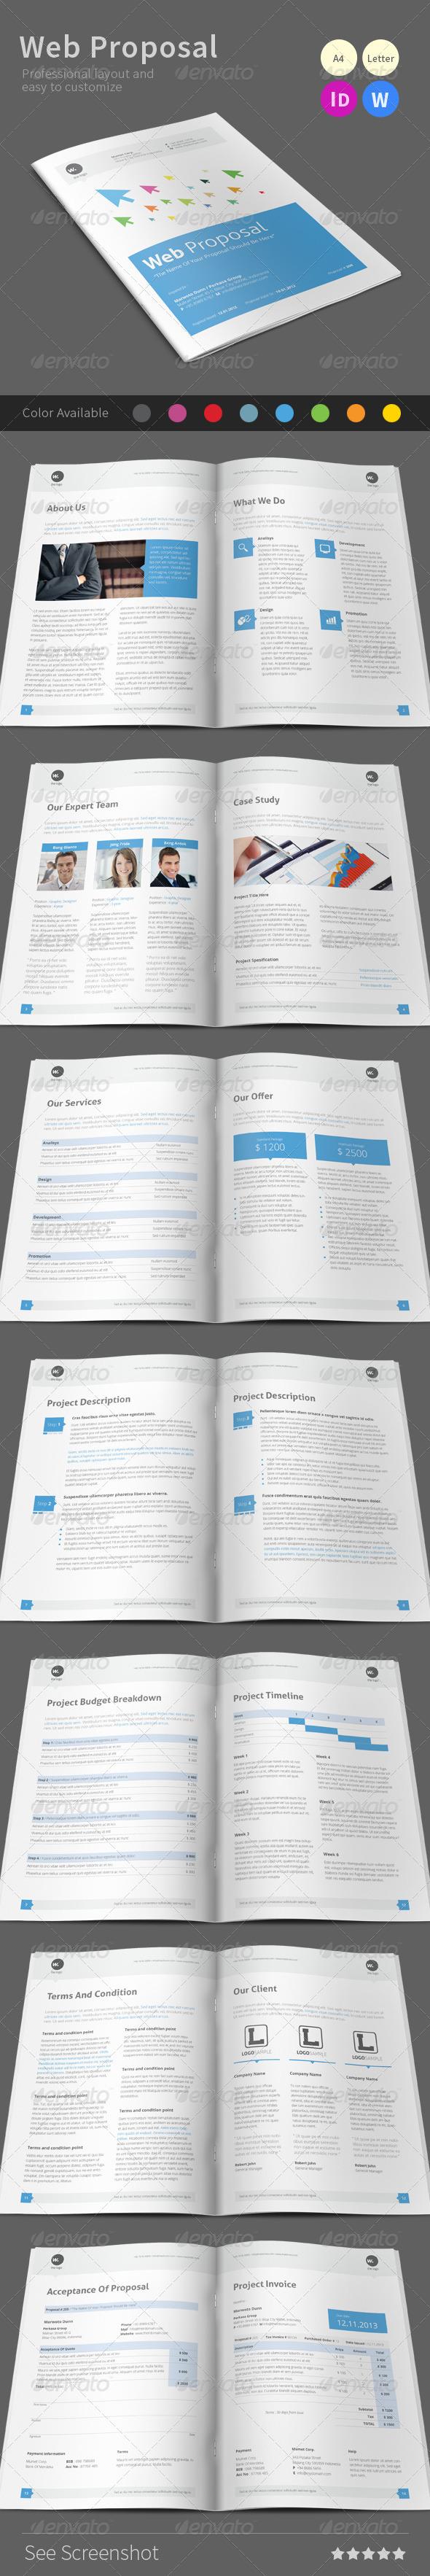 GraphicRiver Web Proposal 6863078